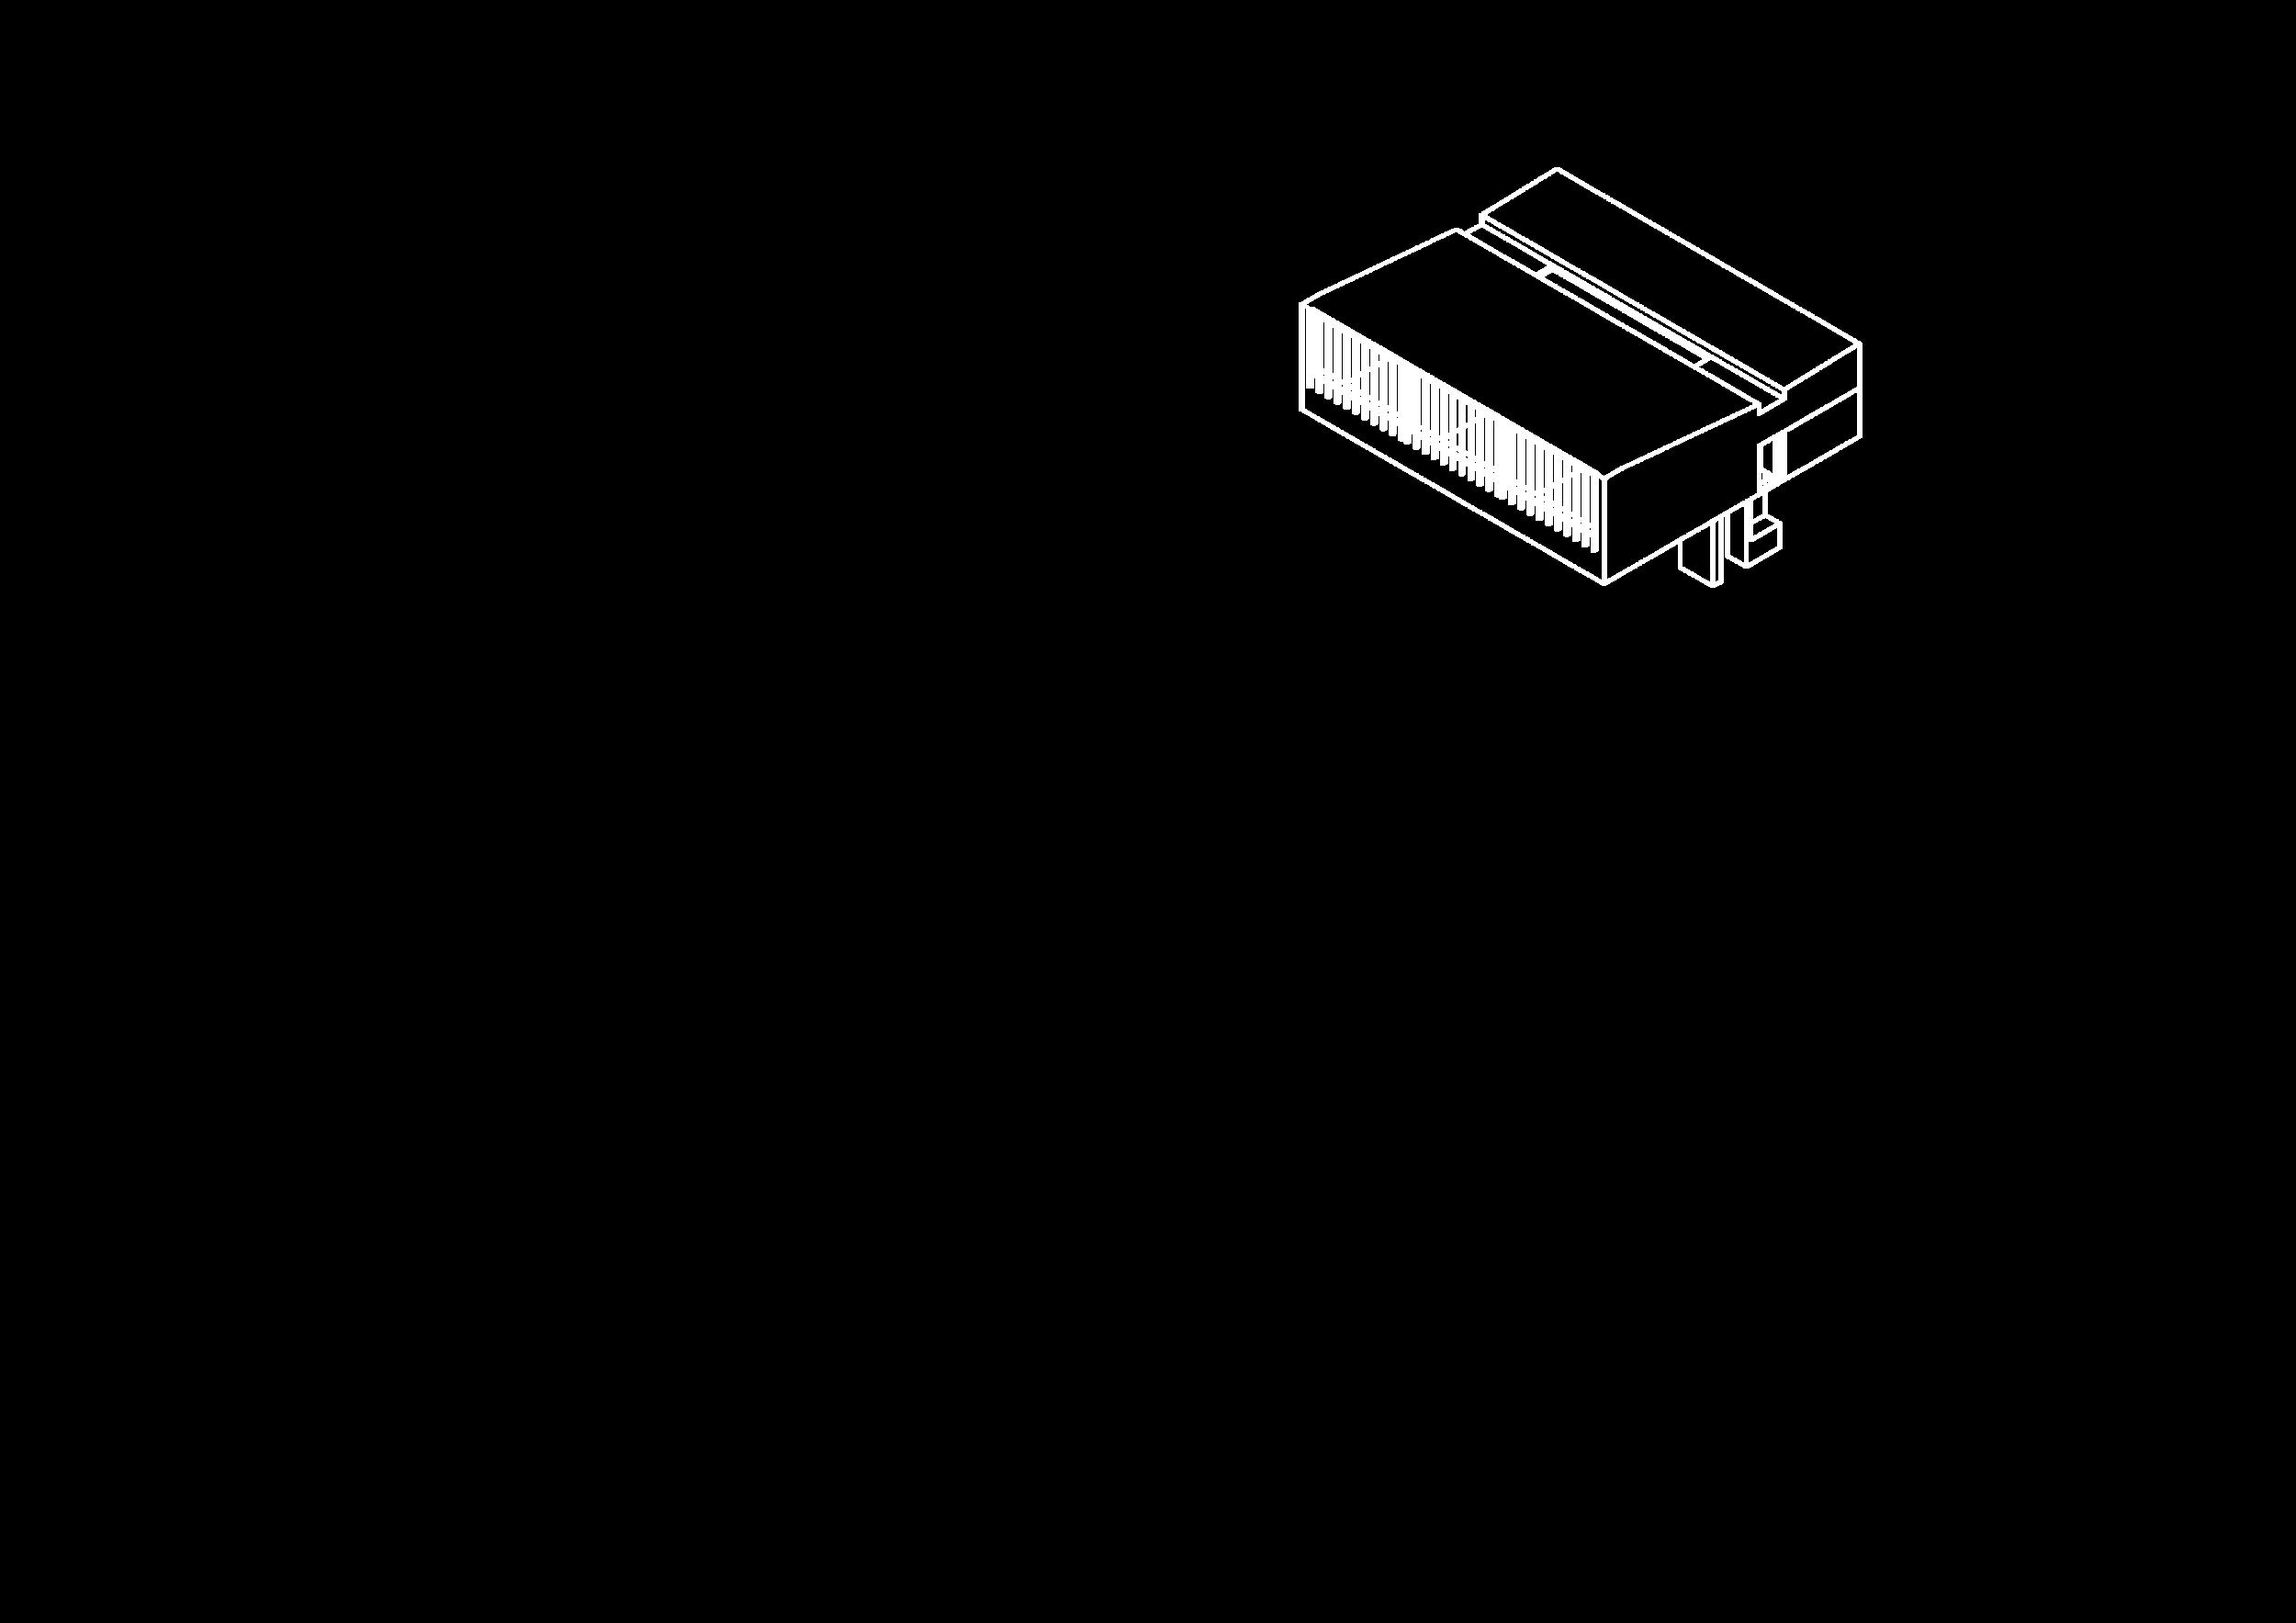 rhrc layout4-04.png